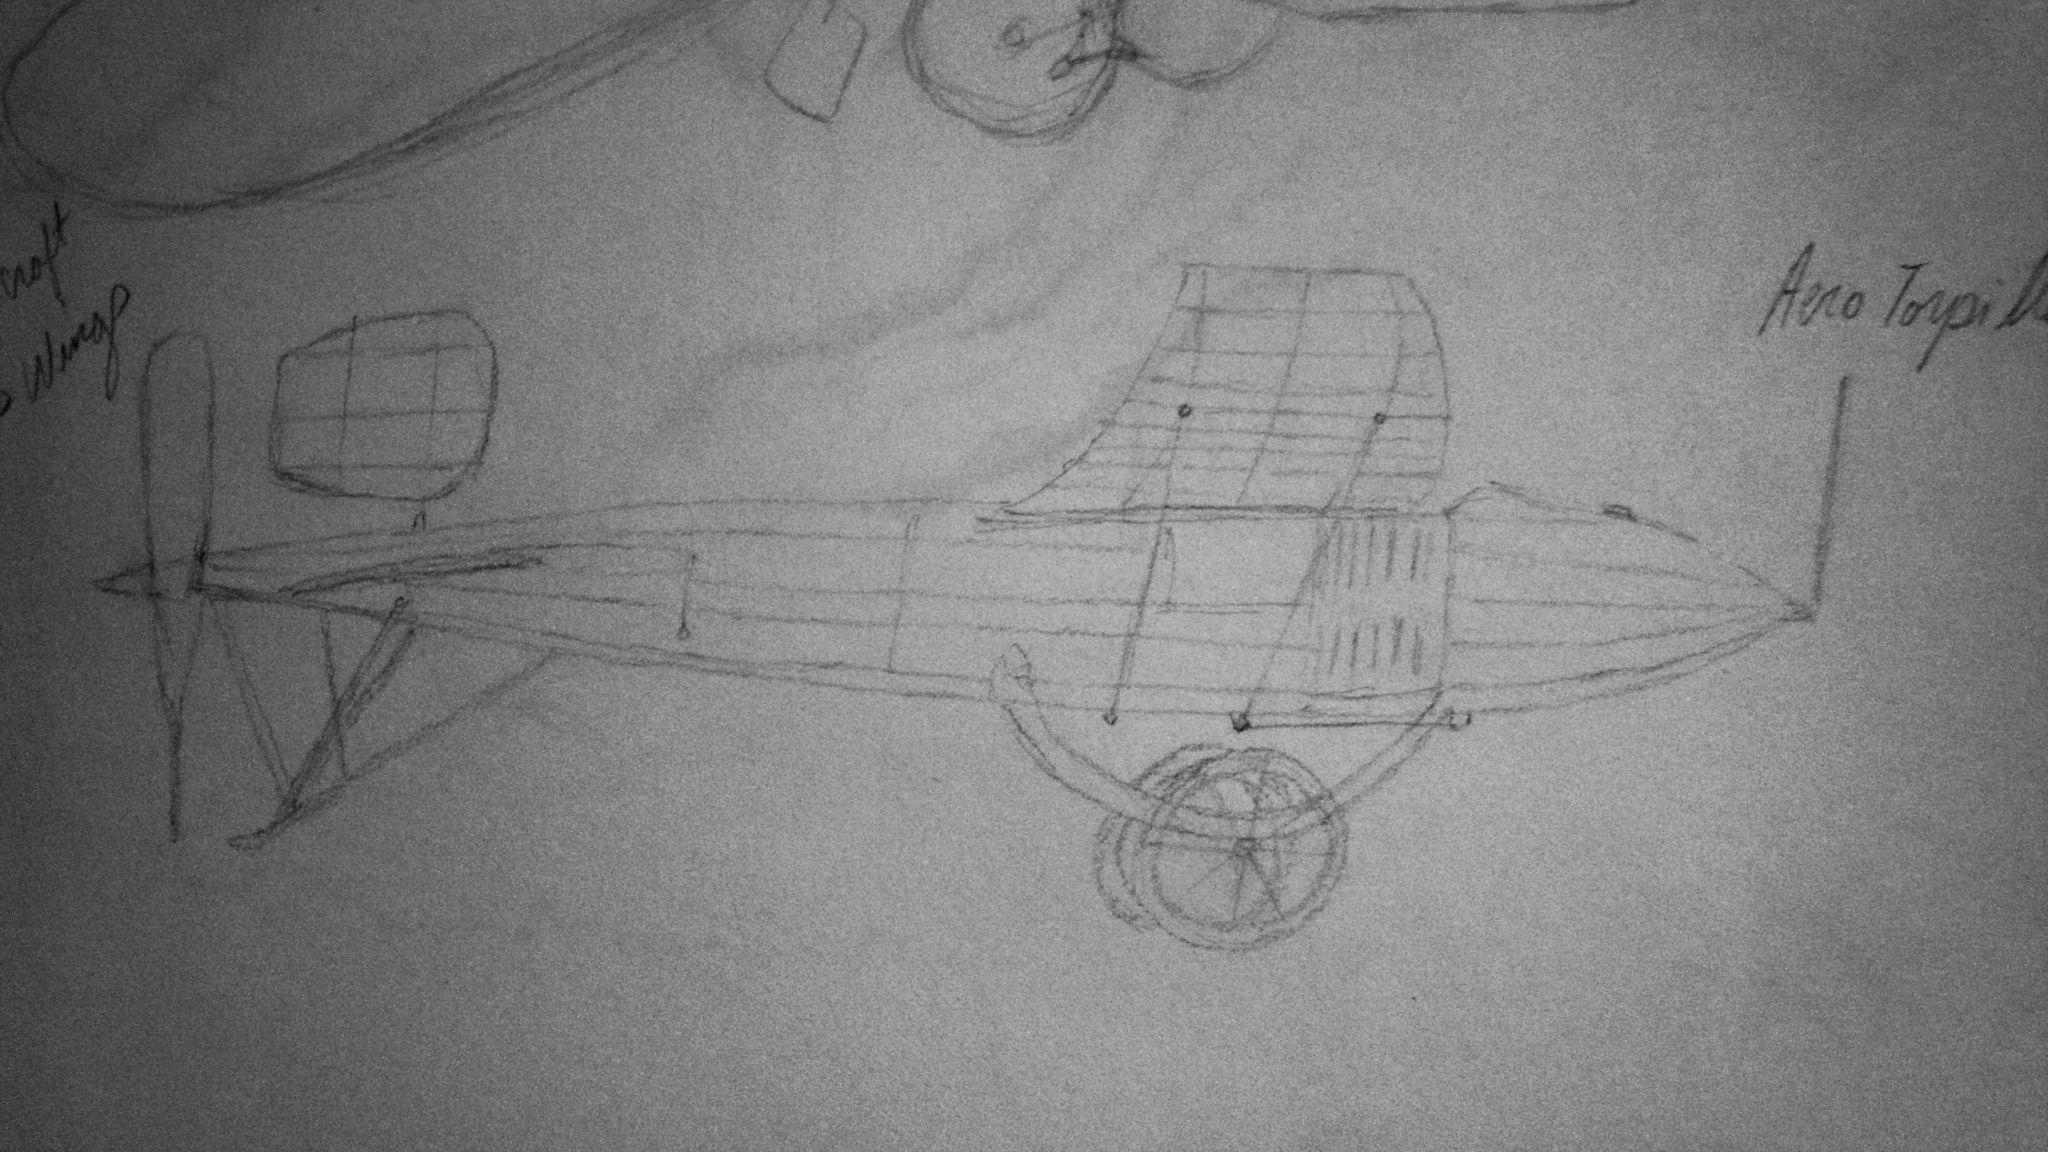 air_plane_concept_art_victor_tatin_ani__tetisheri_2